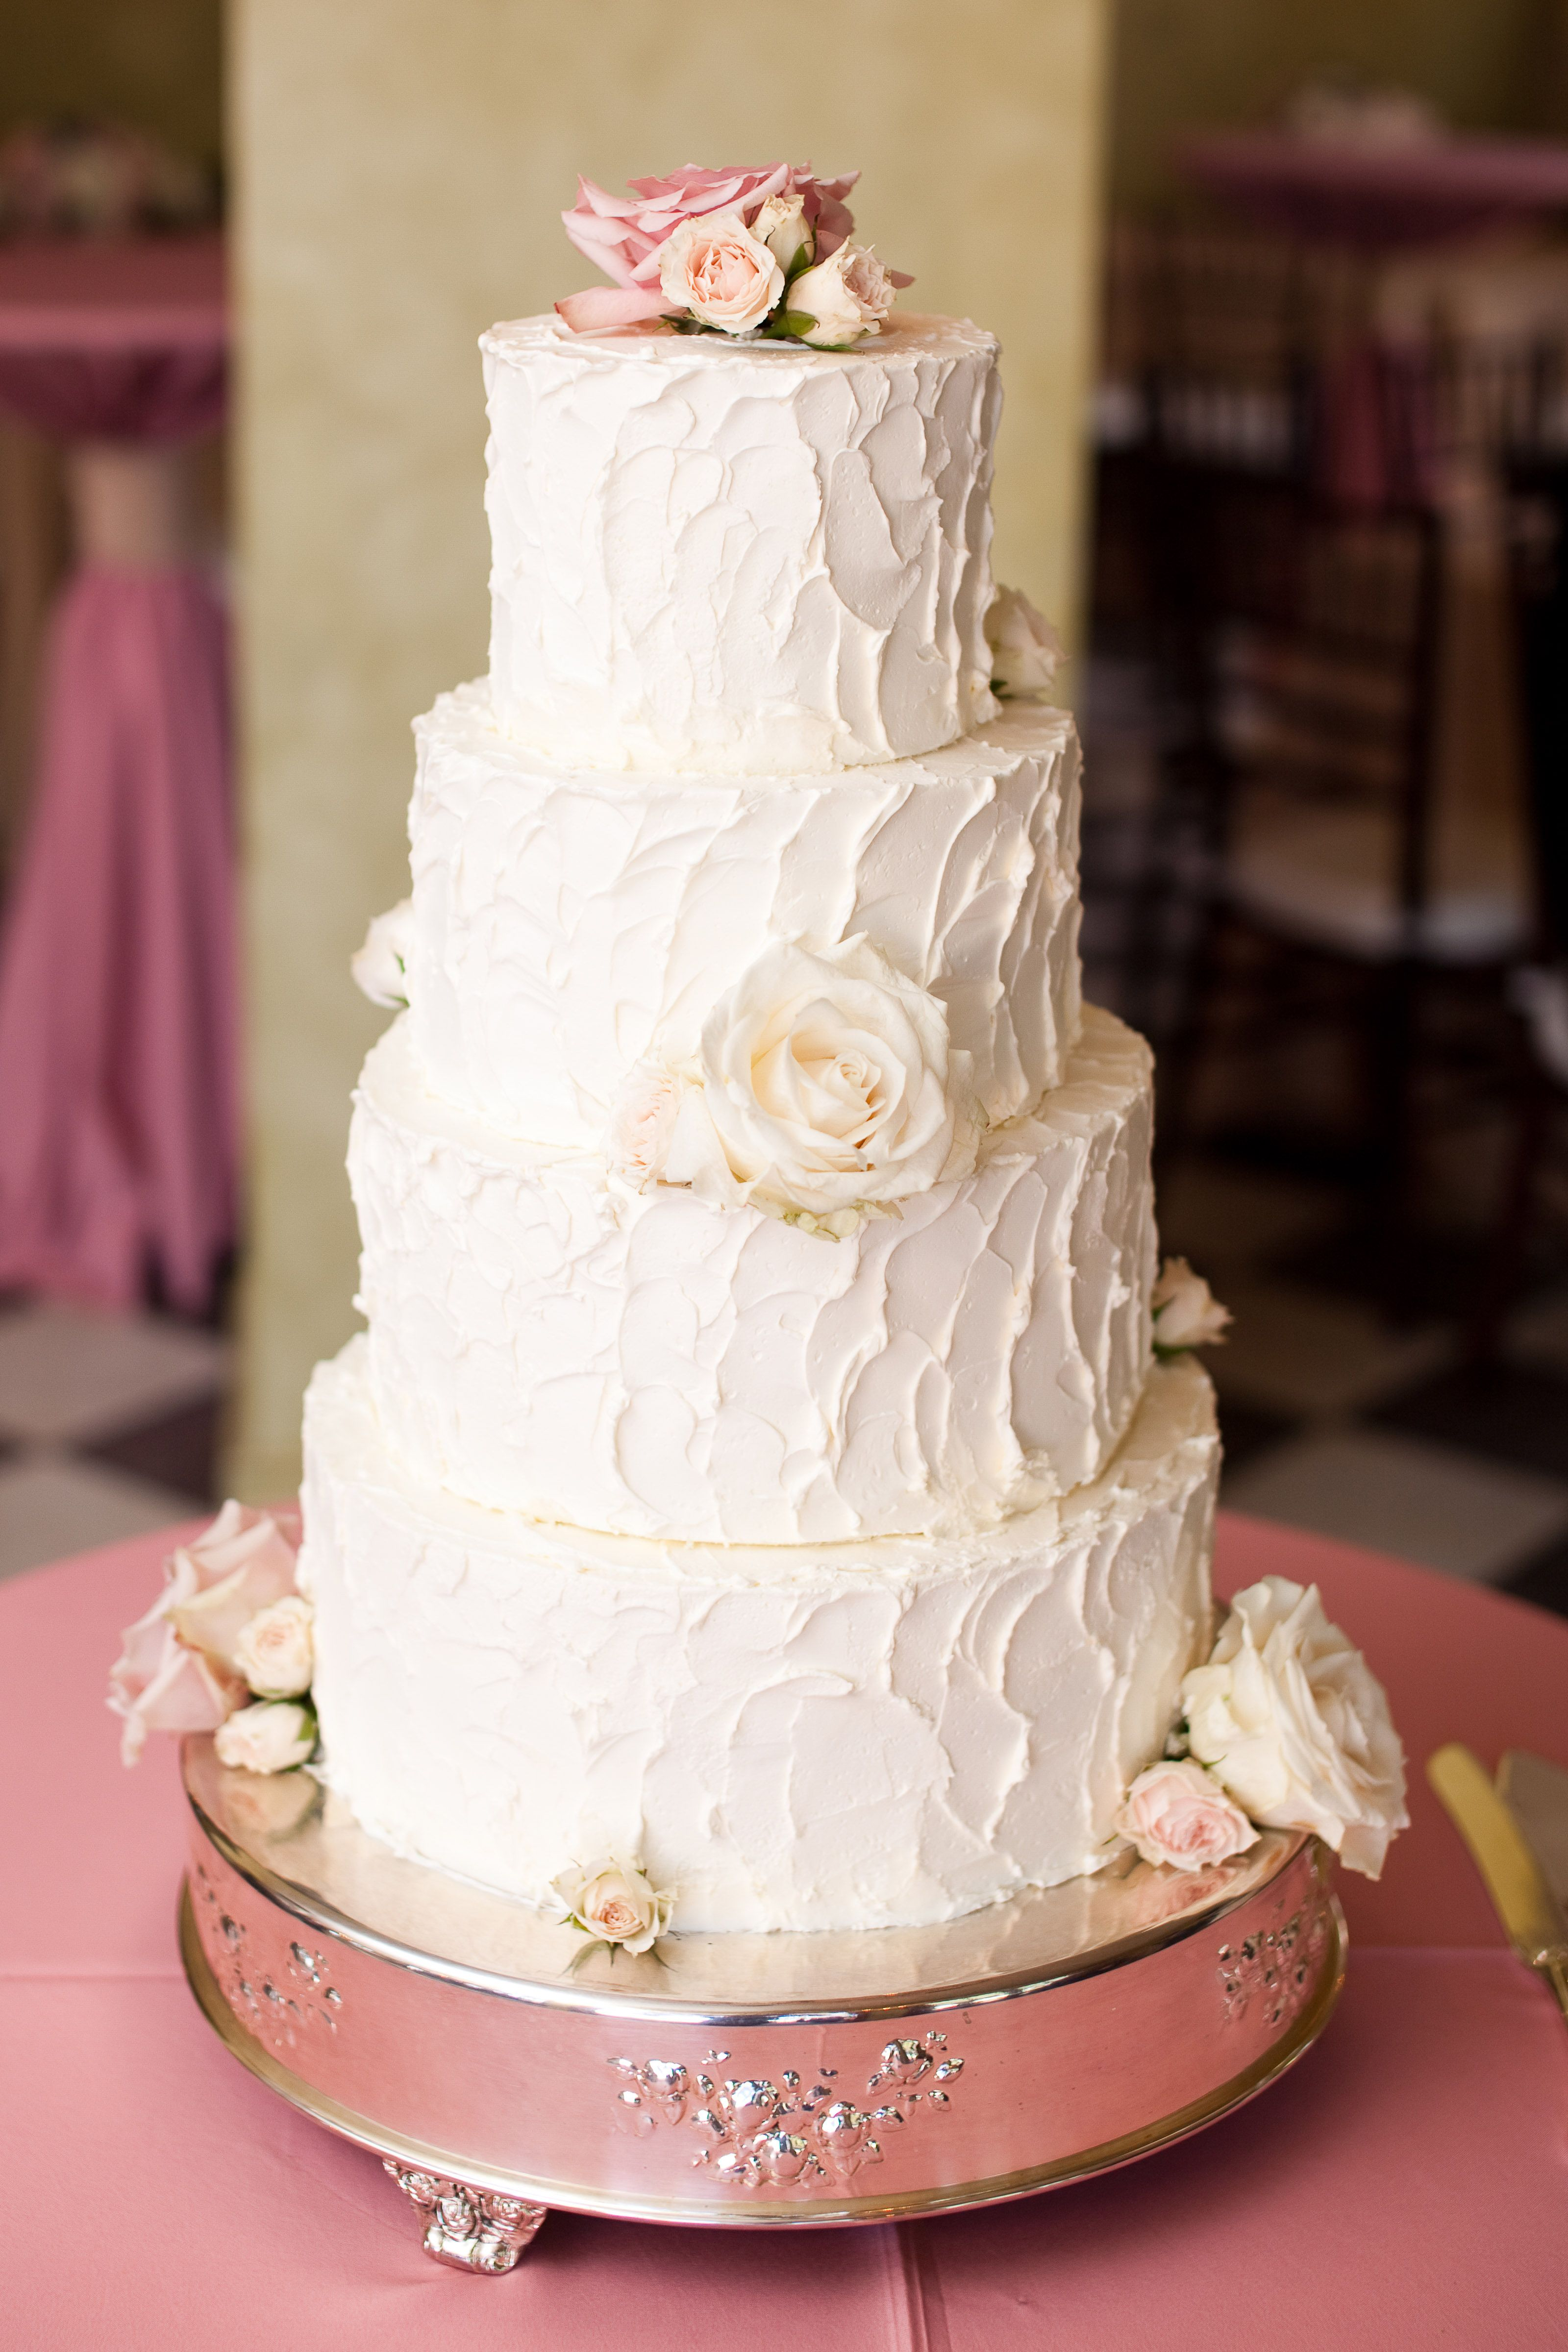 Buttercream Wedding Cake with Fresh Flowers 😘 | Fresh